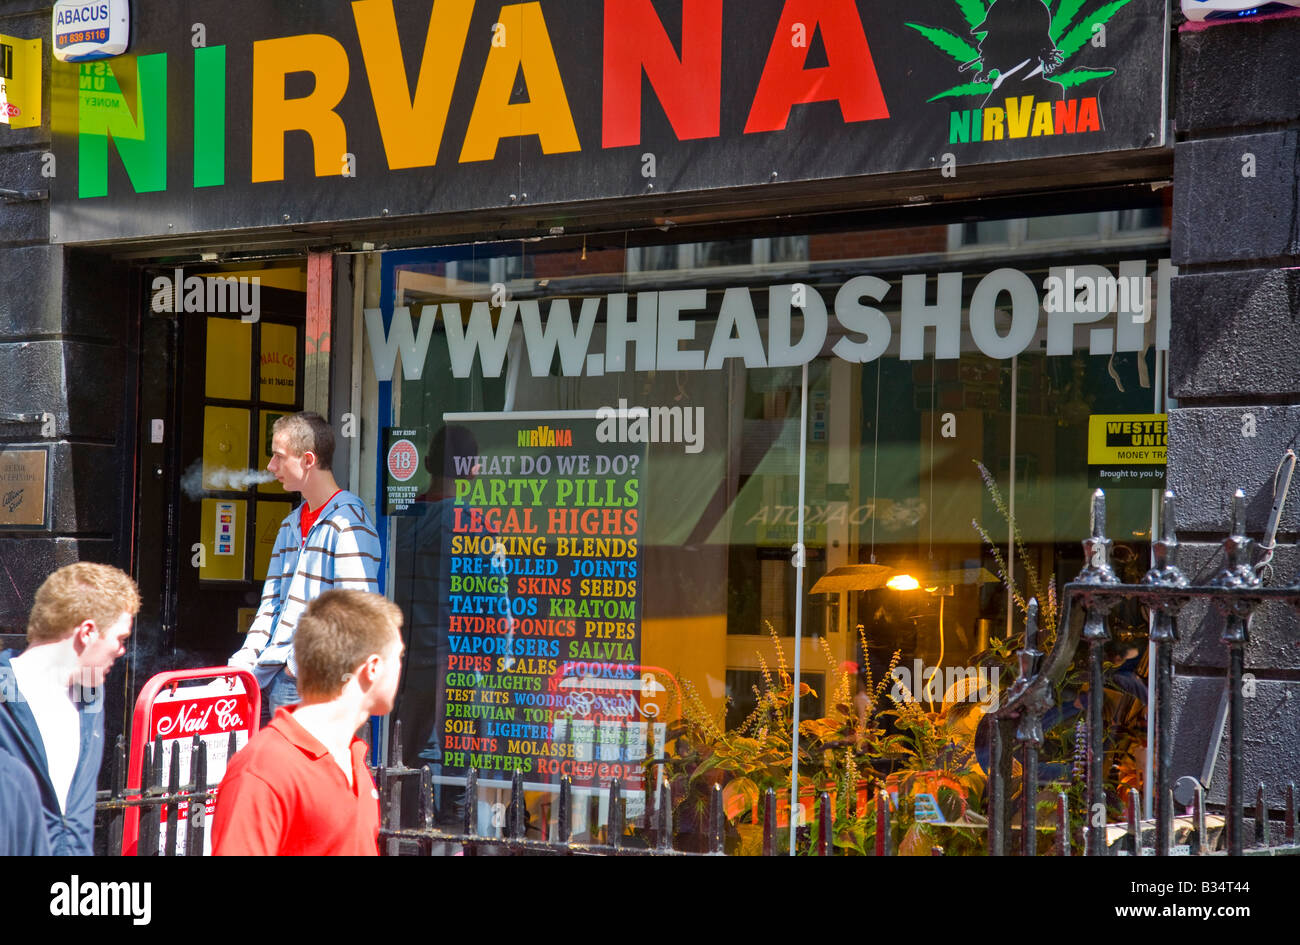 Buy herbal highs - Stock Photo A Shop In Capel Street Dublin Ireland Selling Herbal Highs Legal Drugs